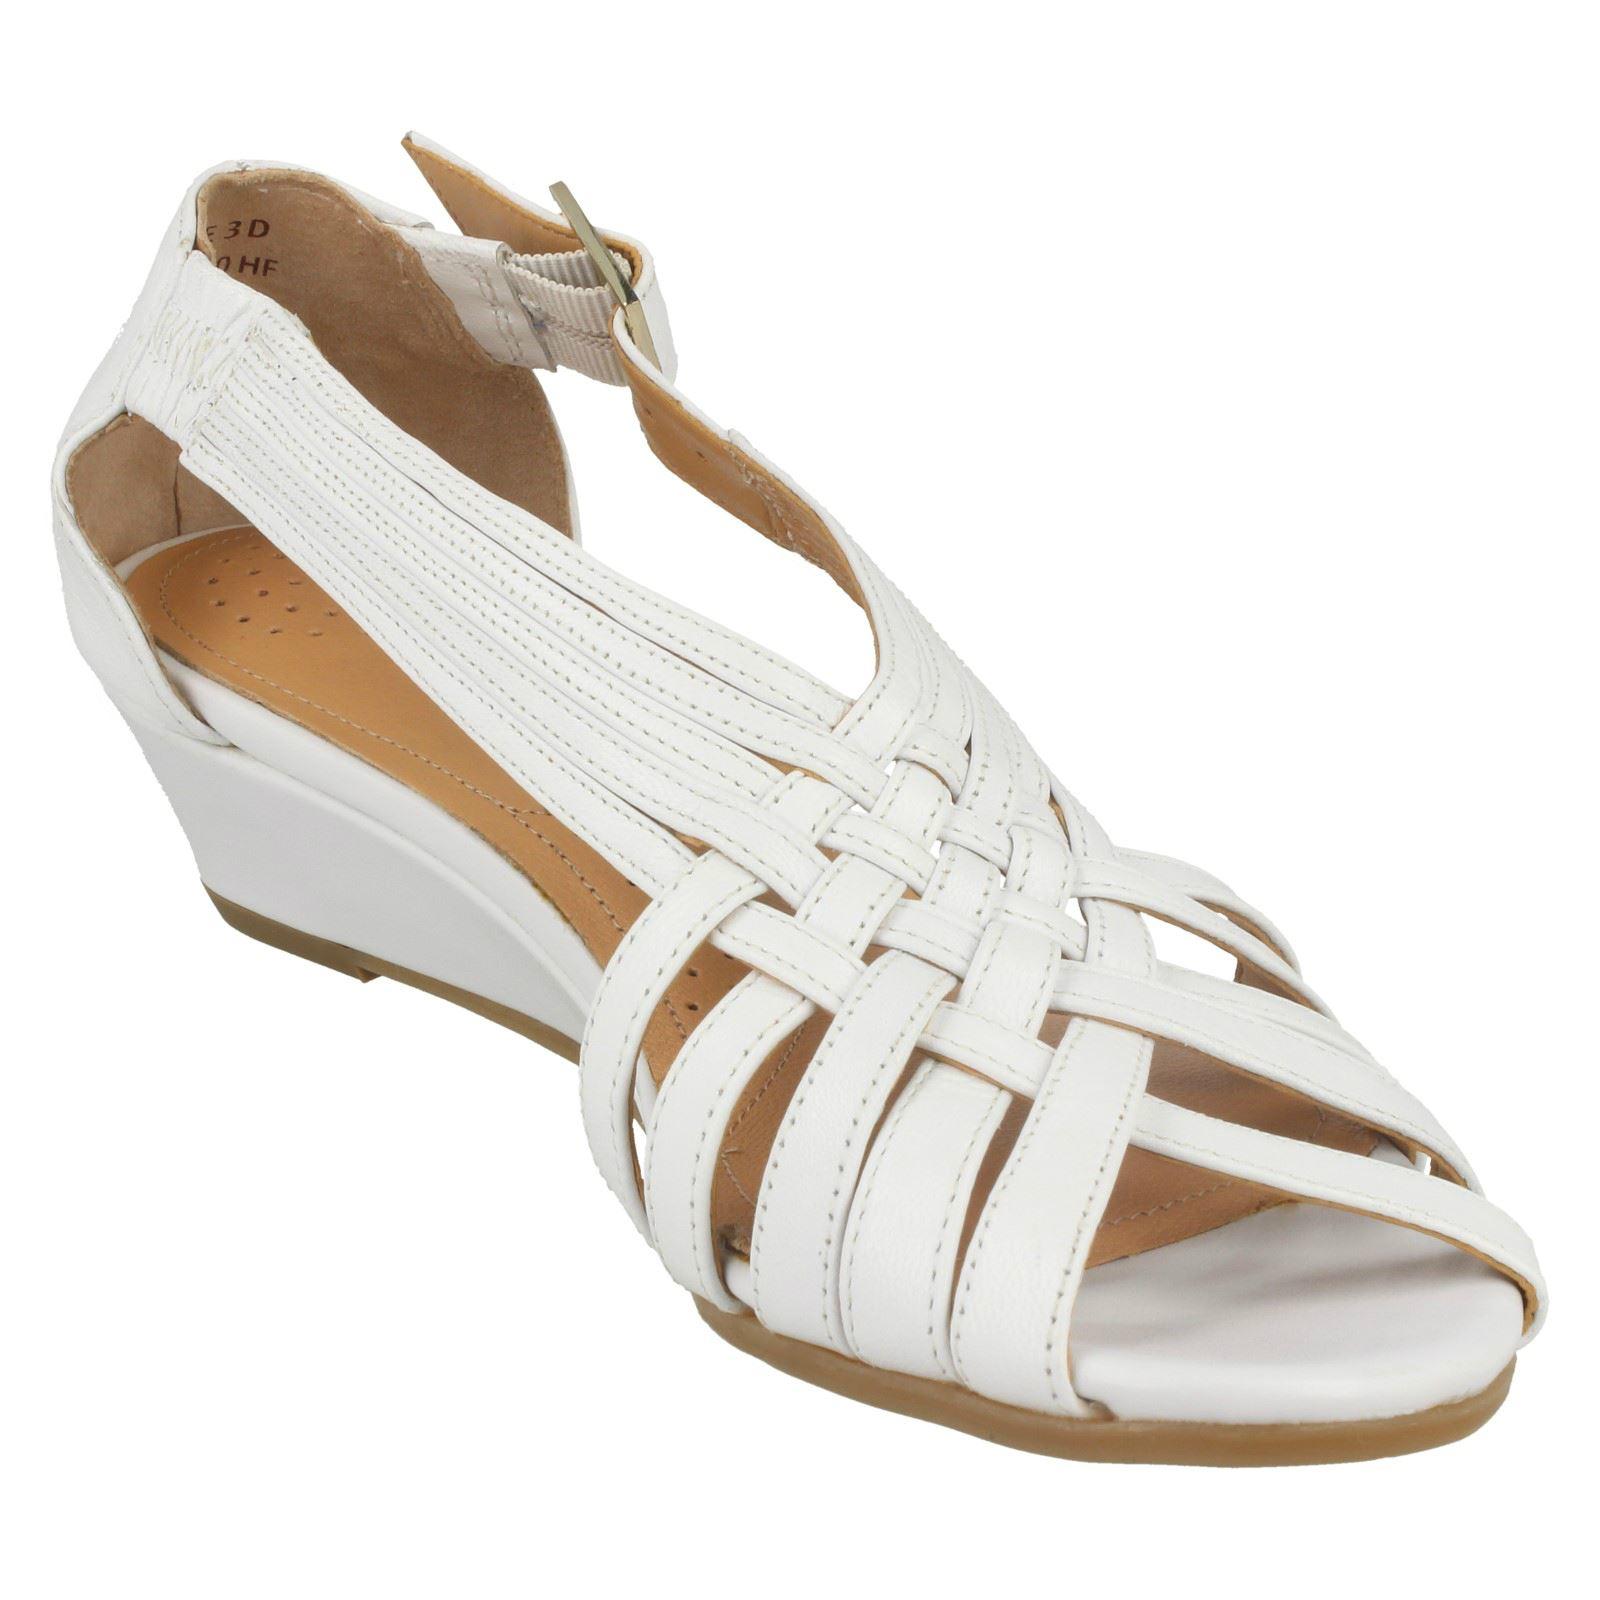 Ladies-Van-Dal-Wedge-Strappy-Sandals-Lucie thumbnail 13